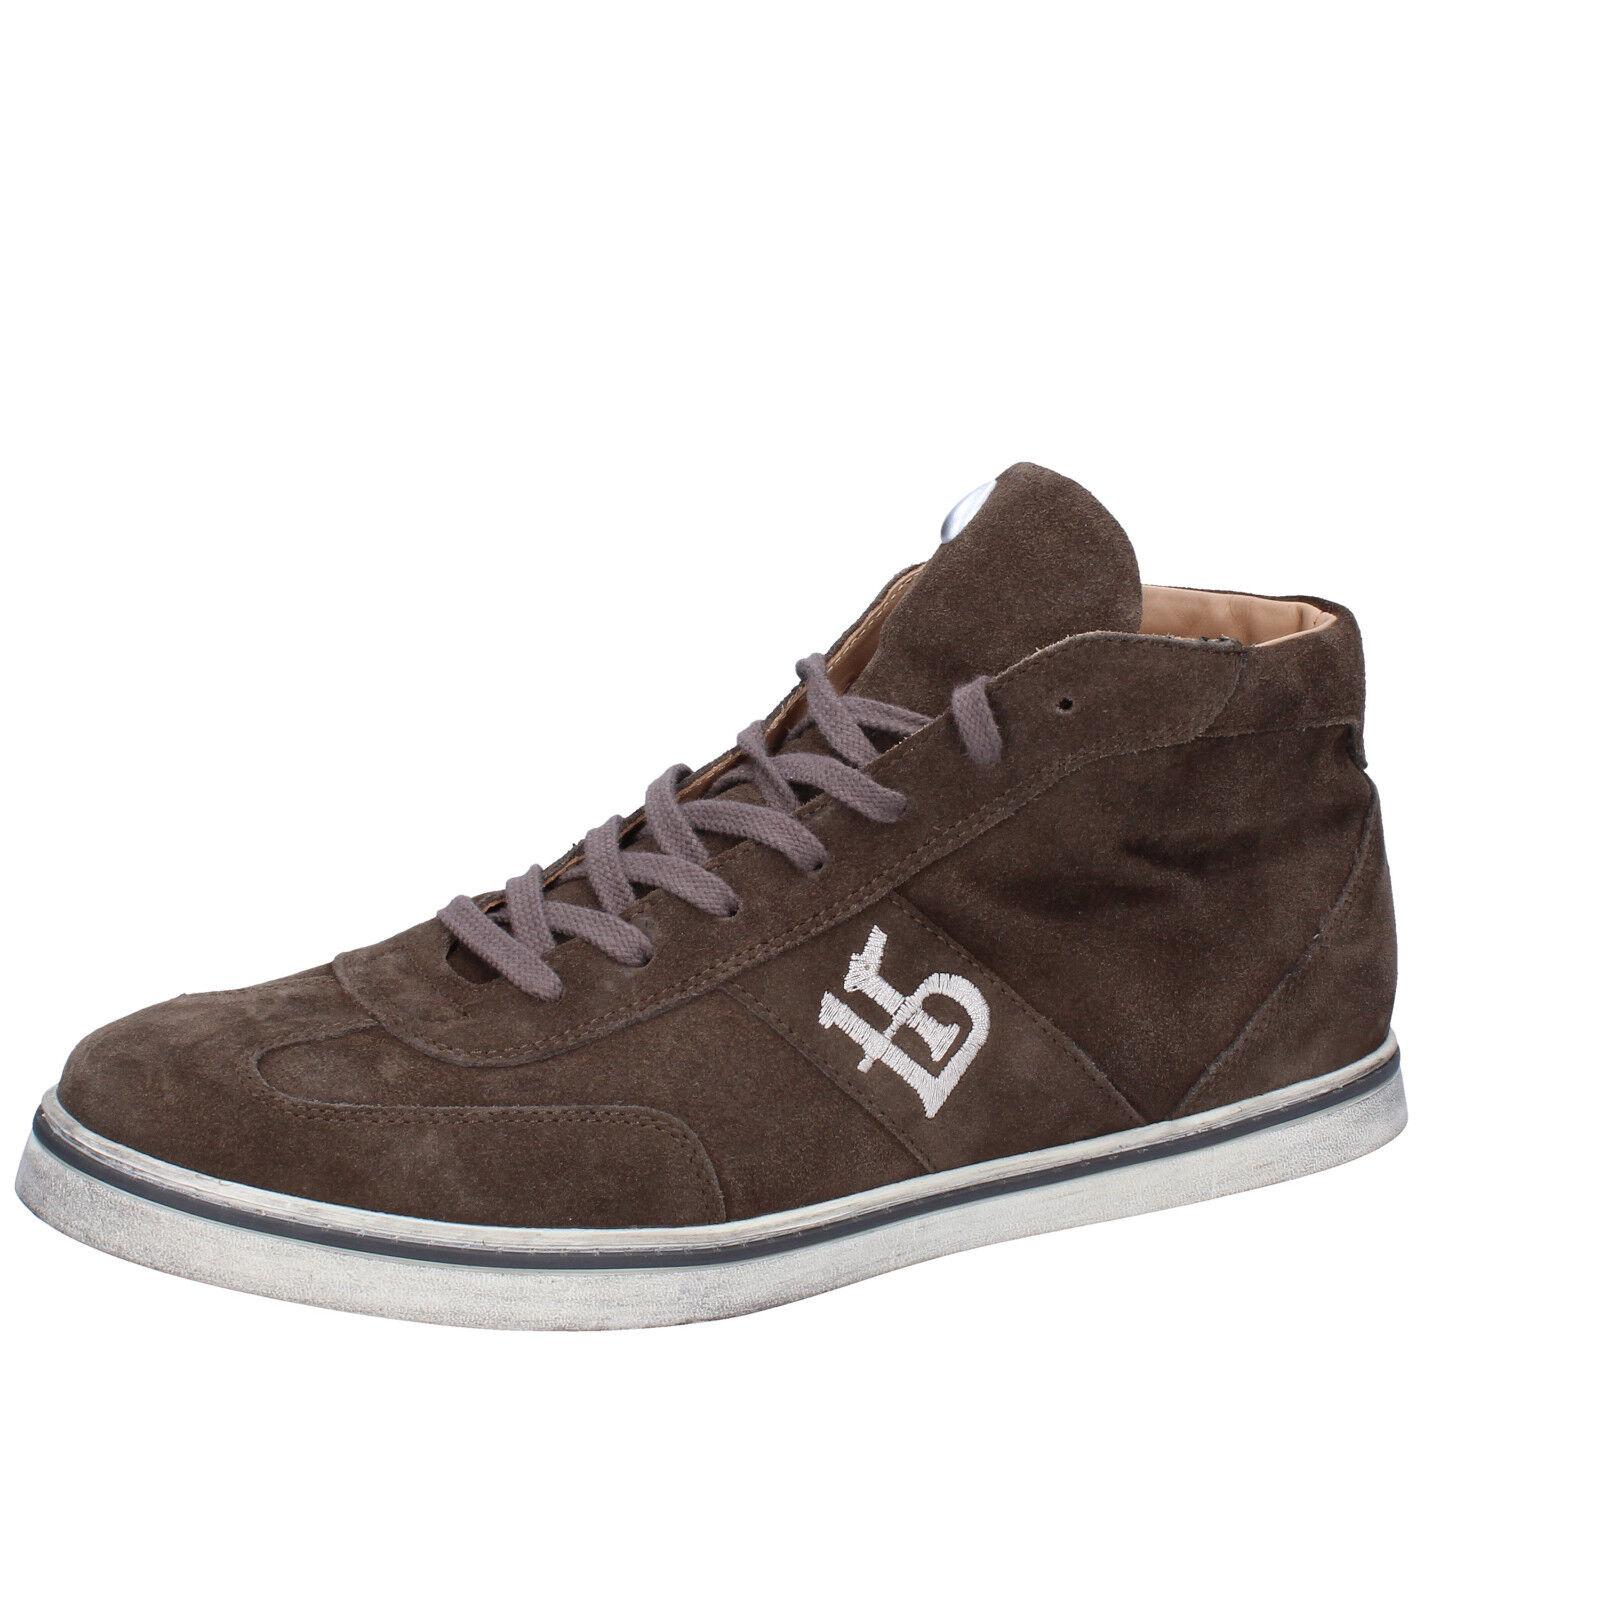 Zapatos para hombre BOTTICELLI Limited 10 () Zapatillas De Gamuza Marrón AH749-D